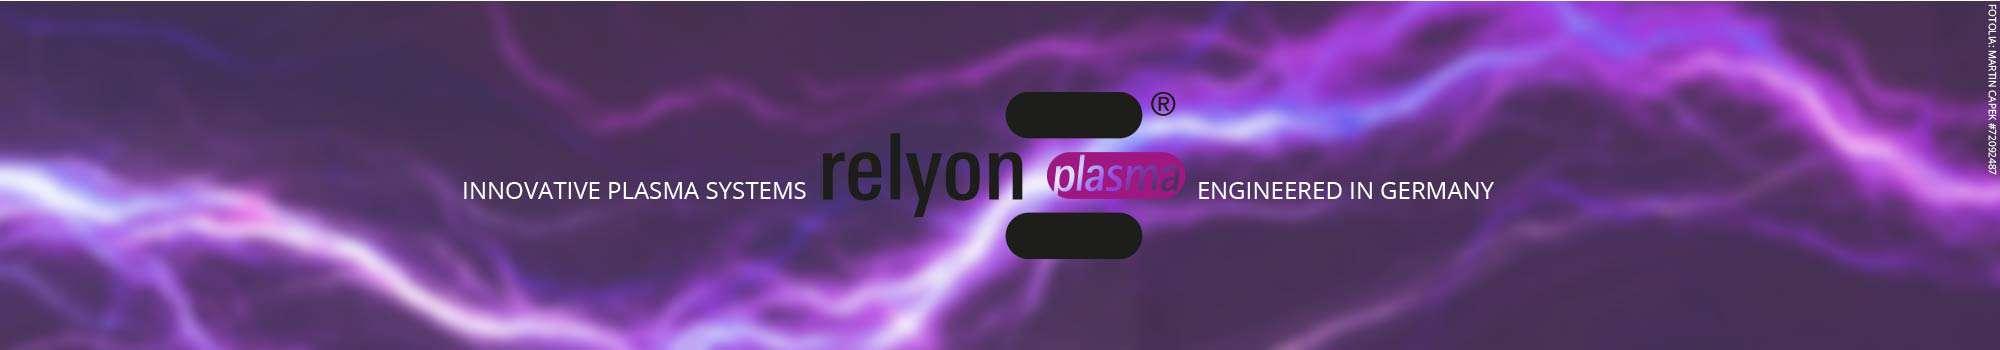 Relyon Plasma Contact